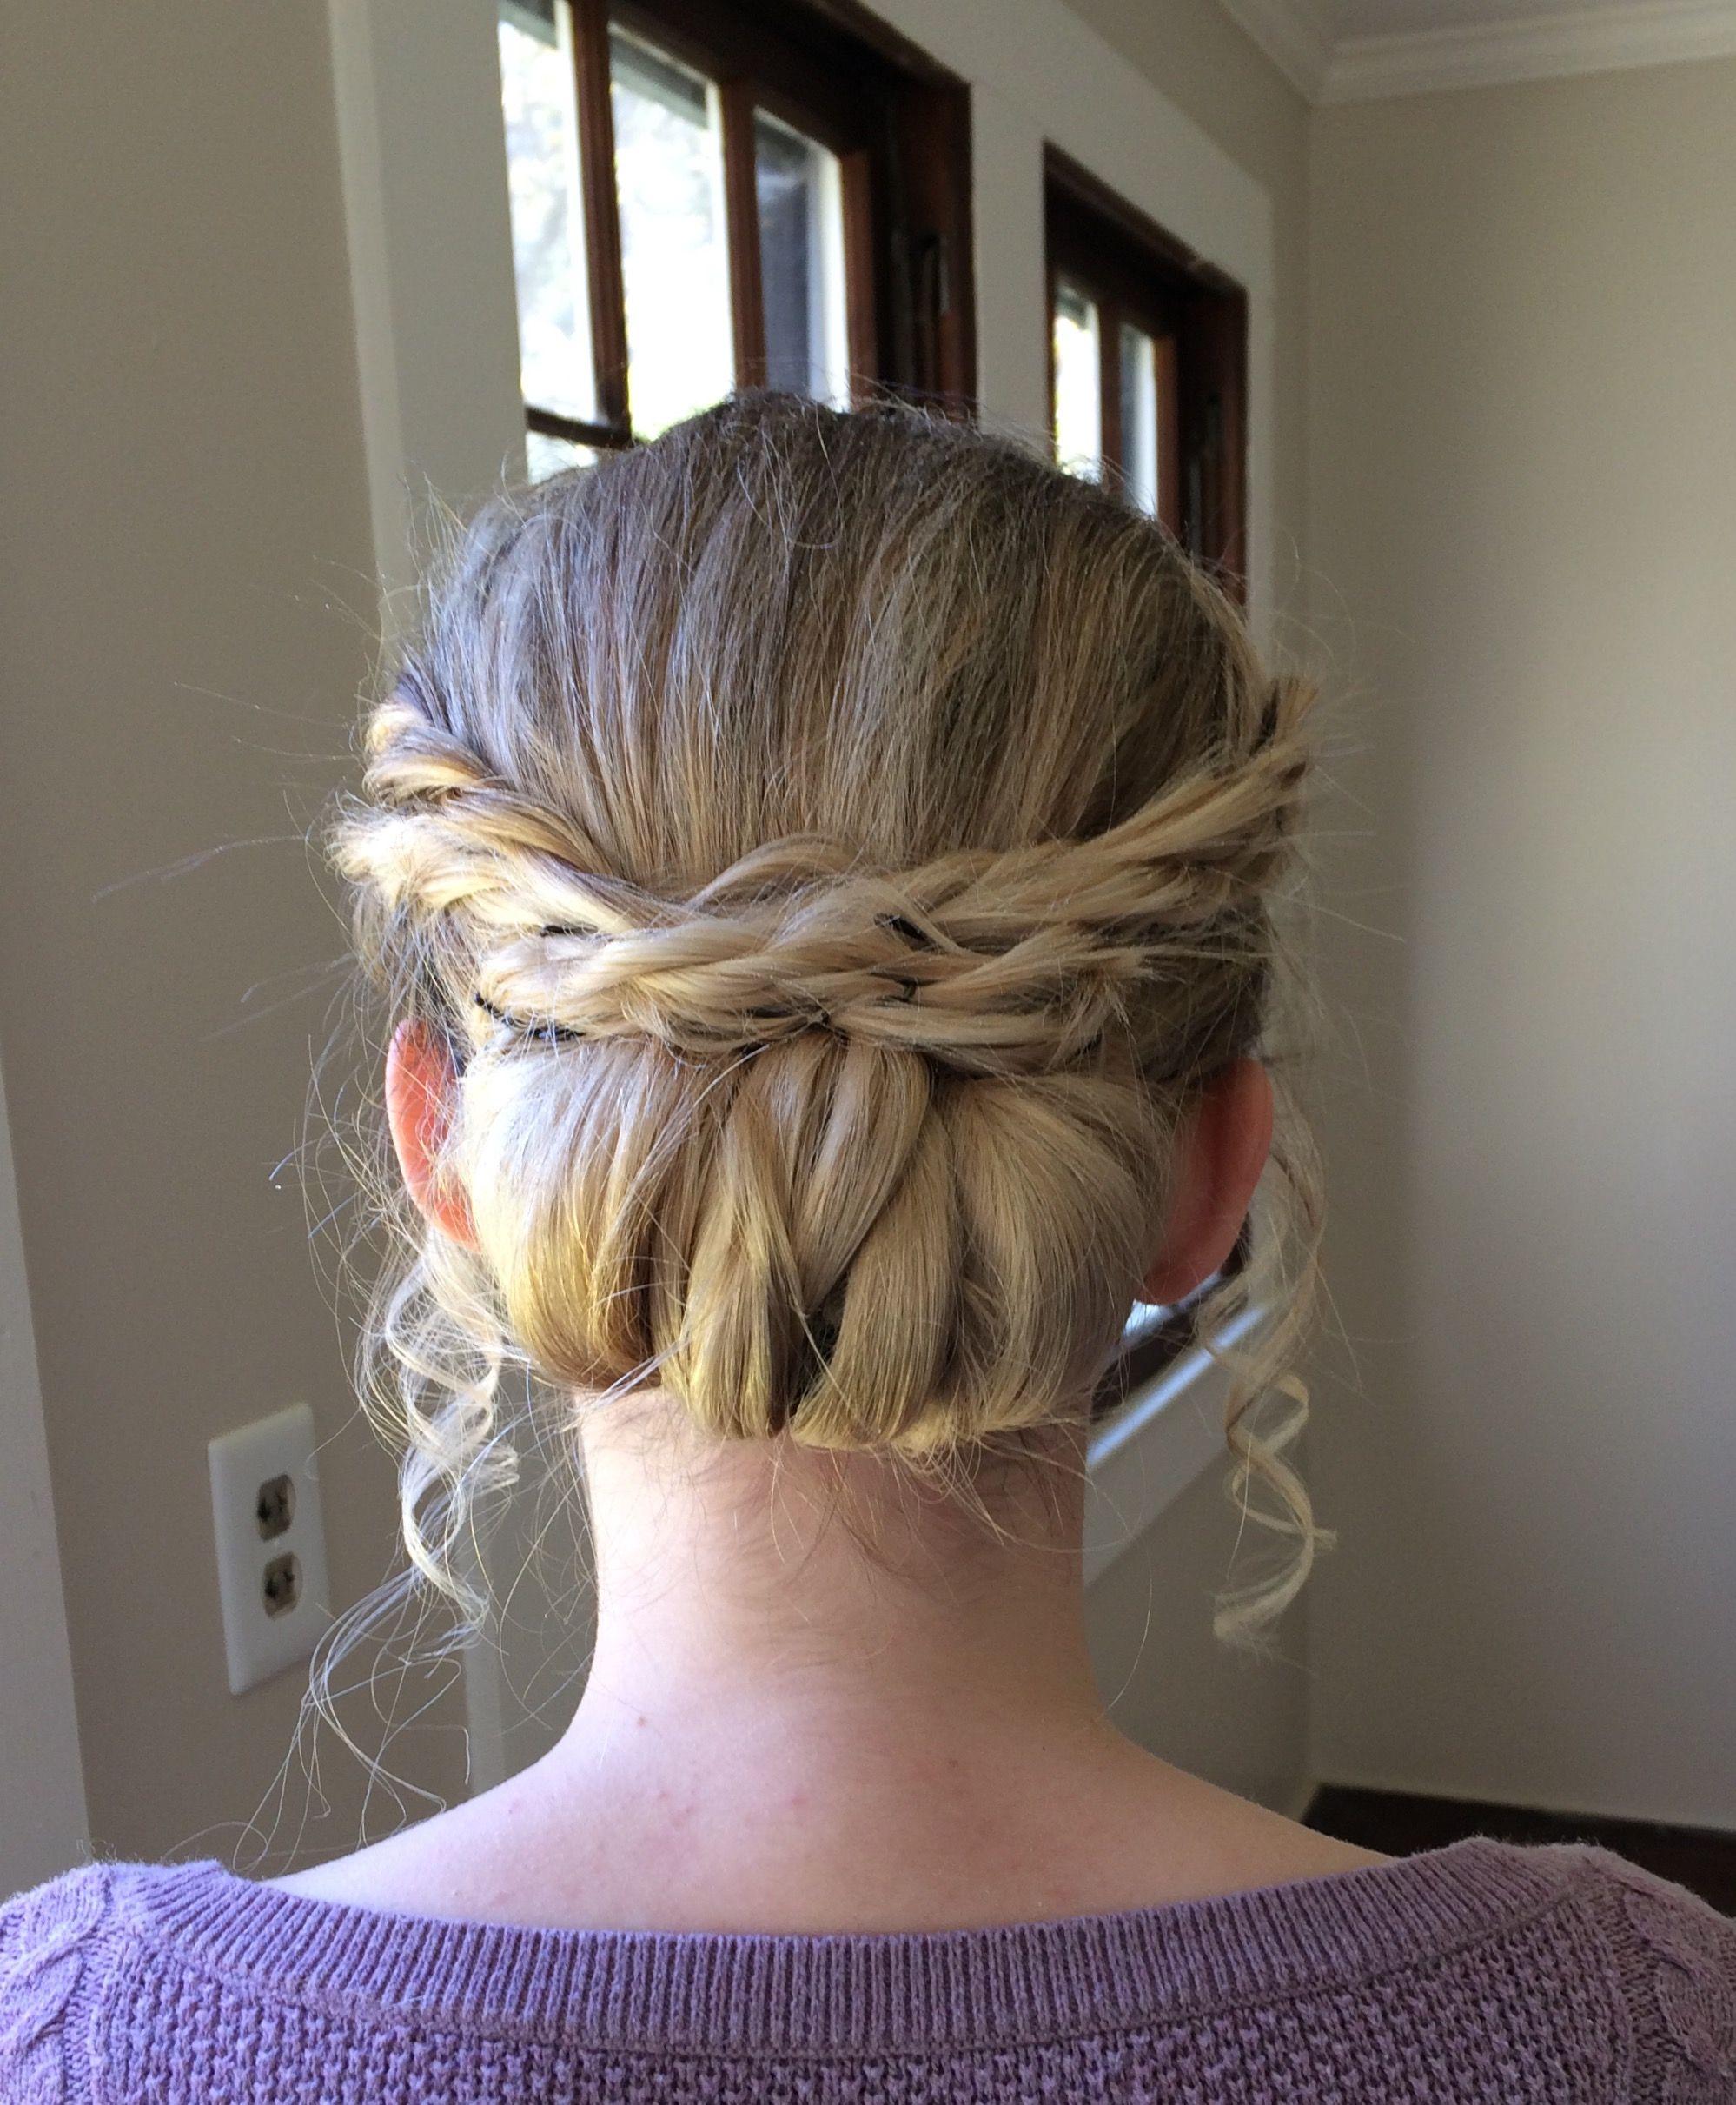 Wedding Hair Formal Hairstyle Updo Hair By Roxy Lexington Nc Primrose Salon Formal Hairstyles Wedding Hairstyles Hair Styles